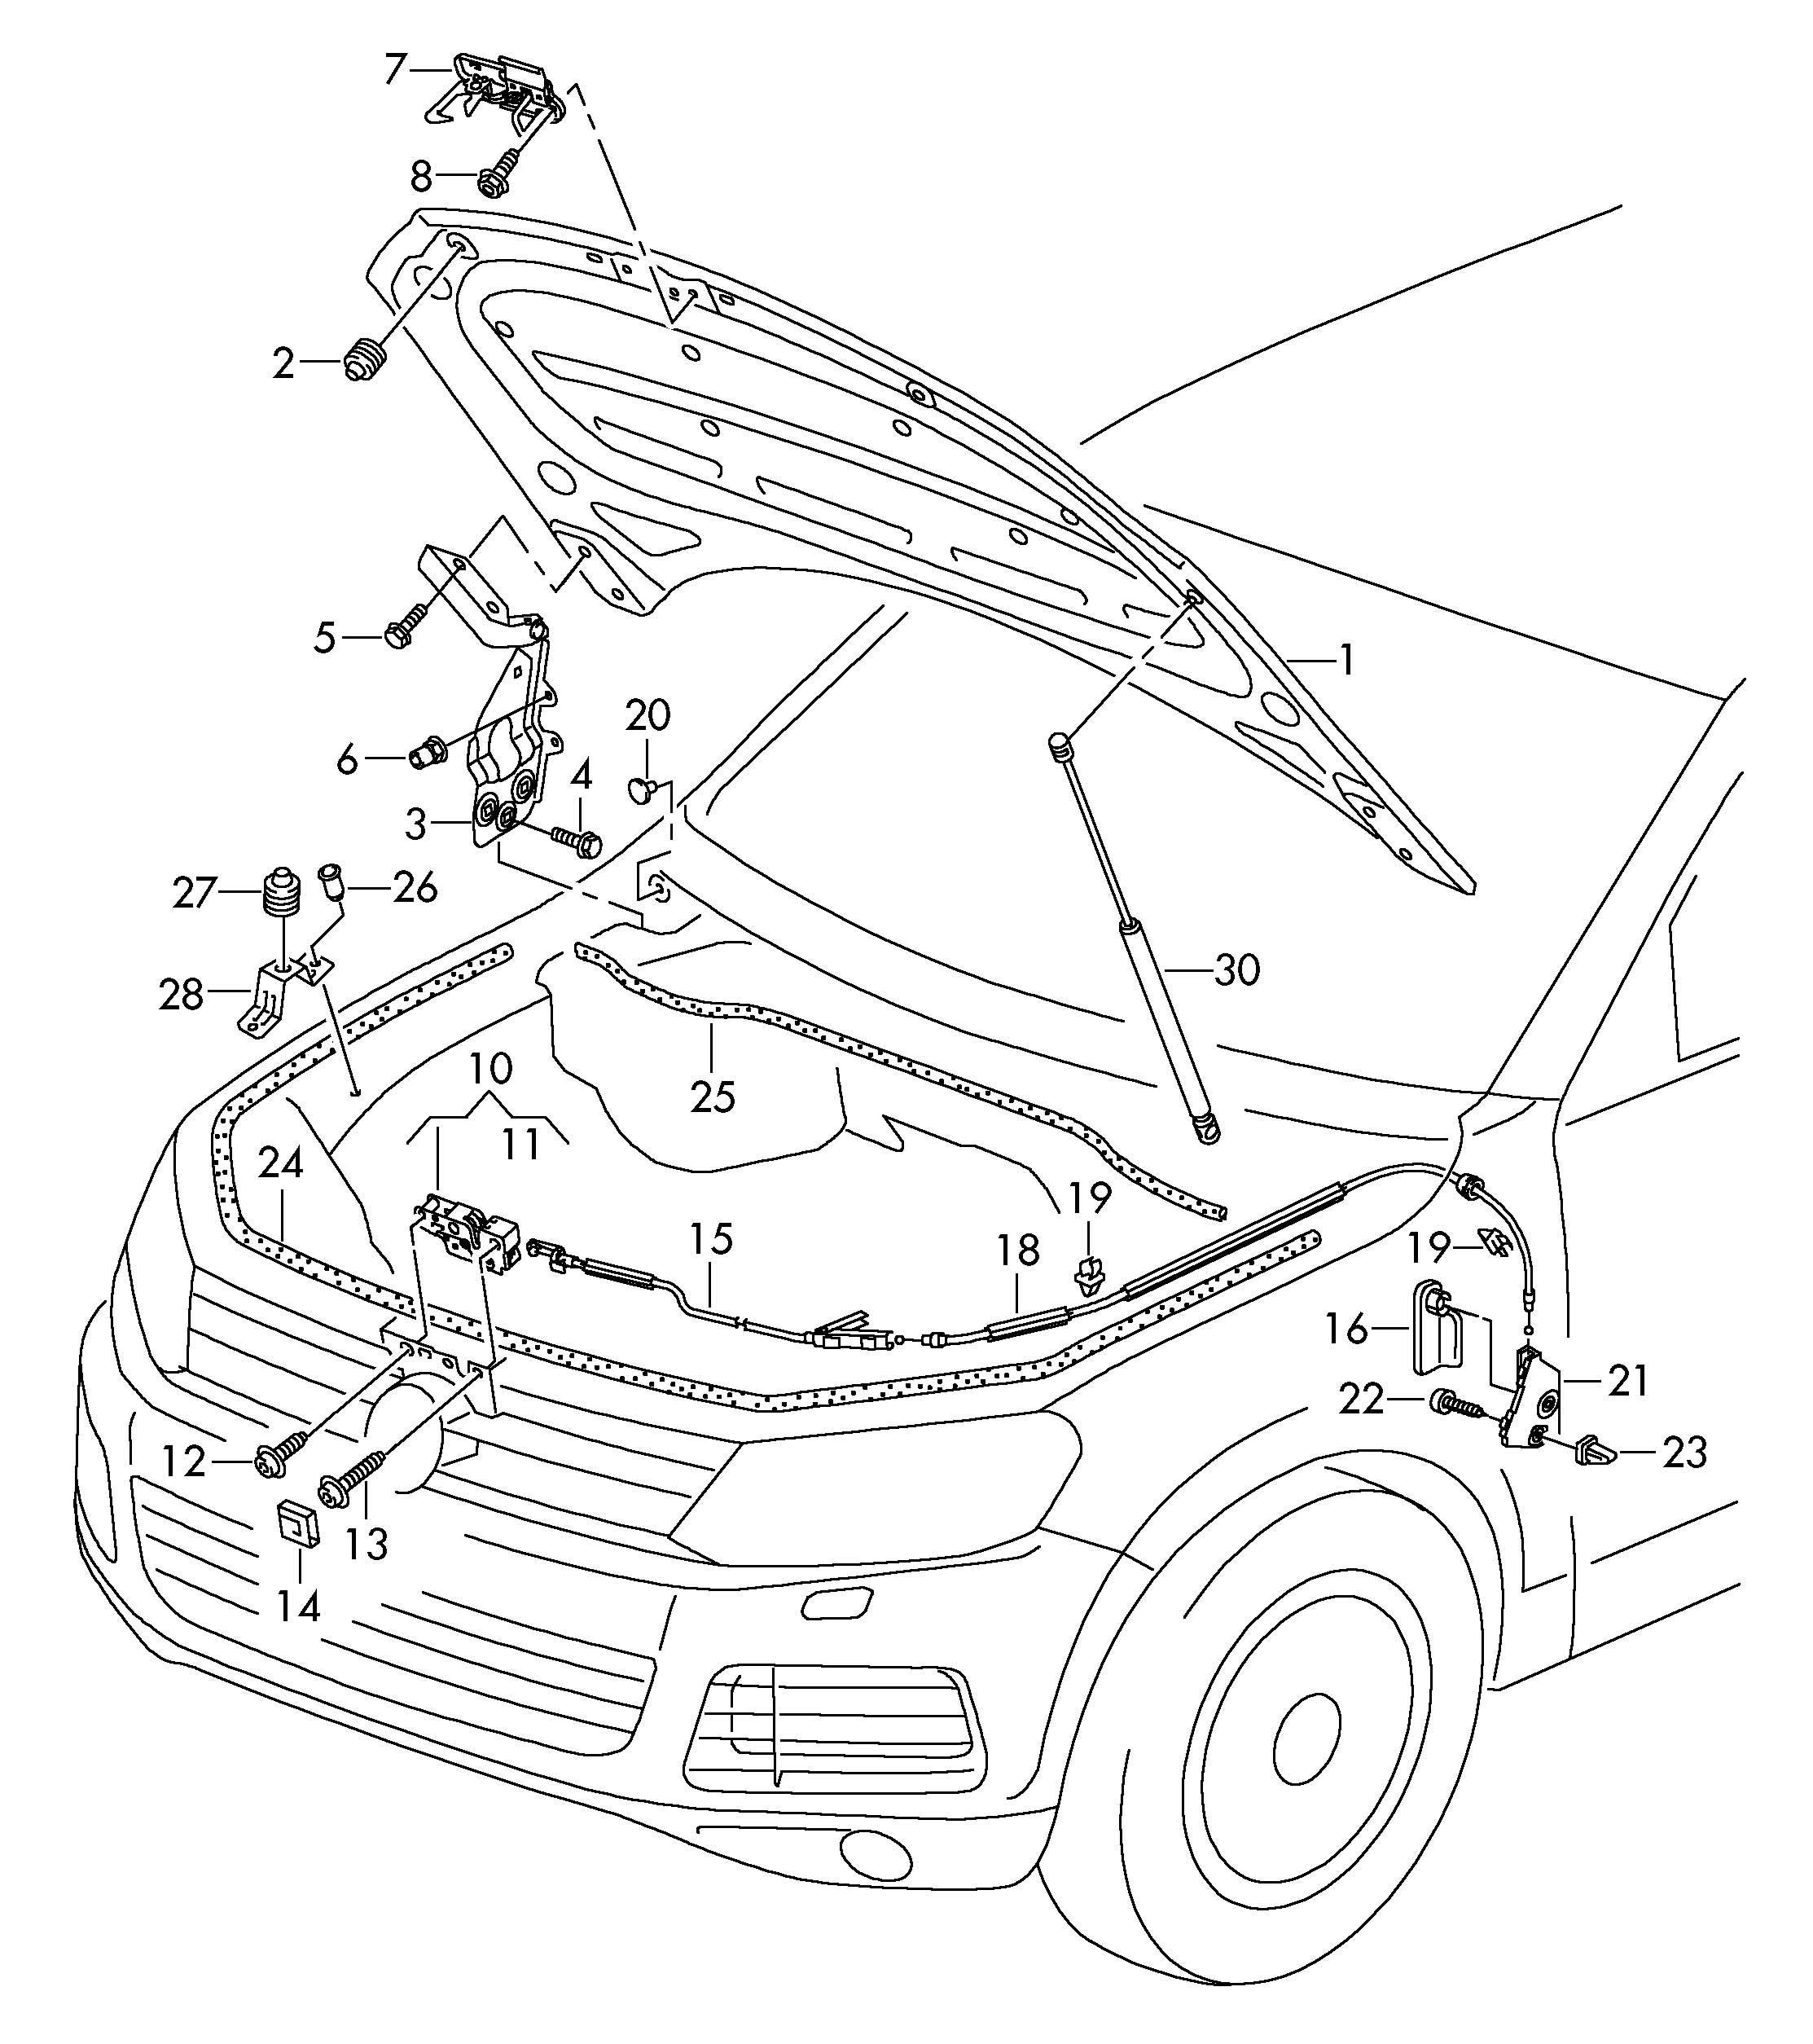 Volkswagen Touareg Bolt, hex. Hd. (combi.) self-locking